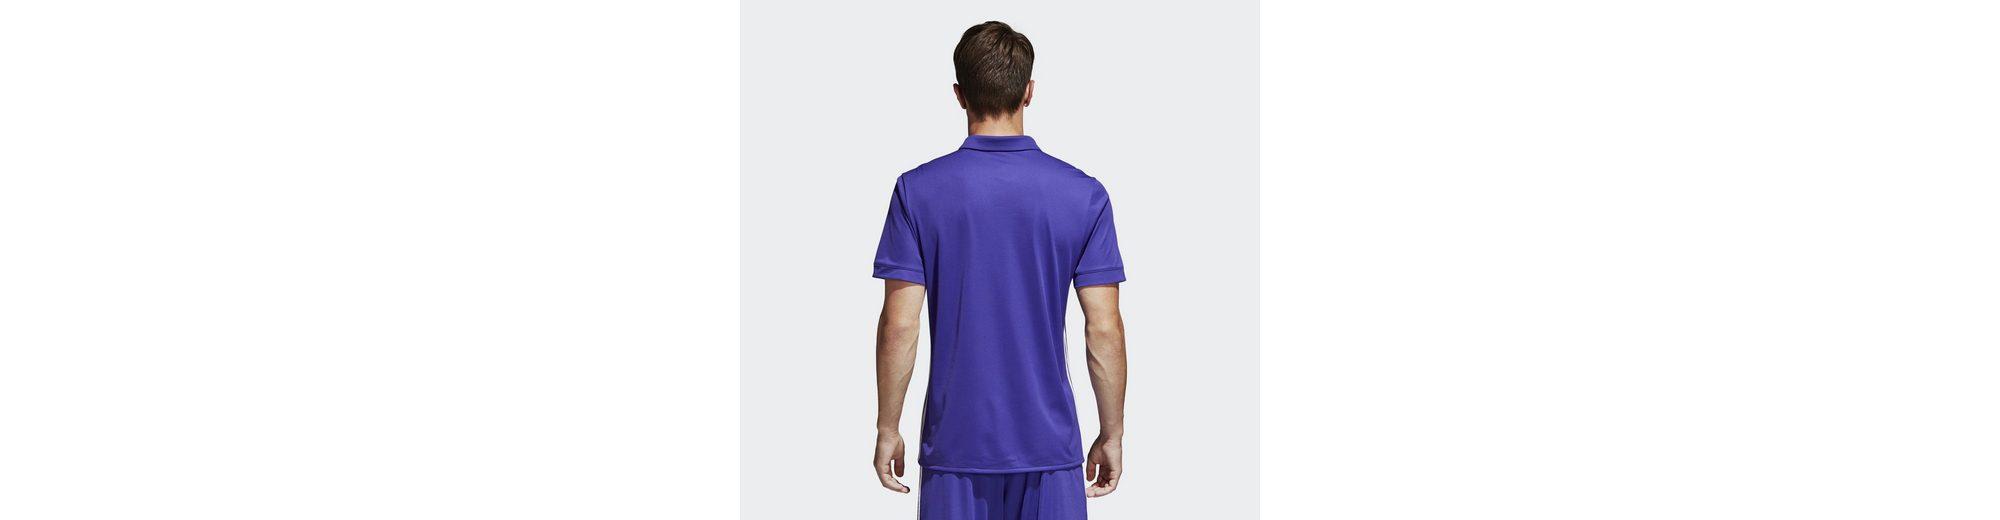 Performance Performance Footballtrikot Footballtrikot Adidas Marseille Adidas Olympique 6wqnfnTx5B